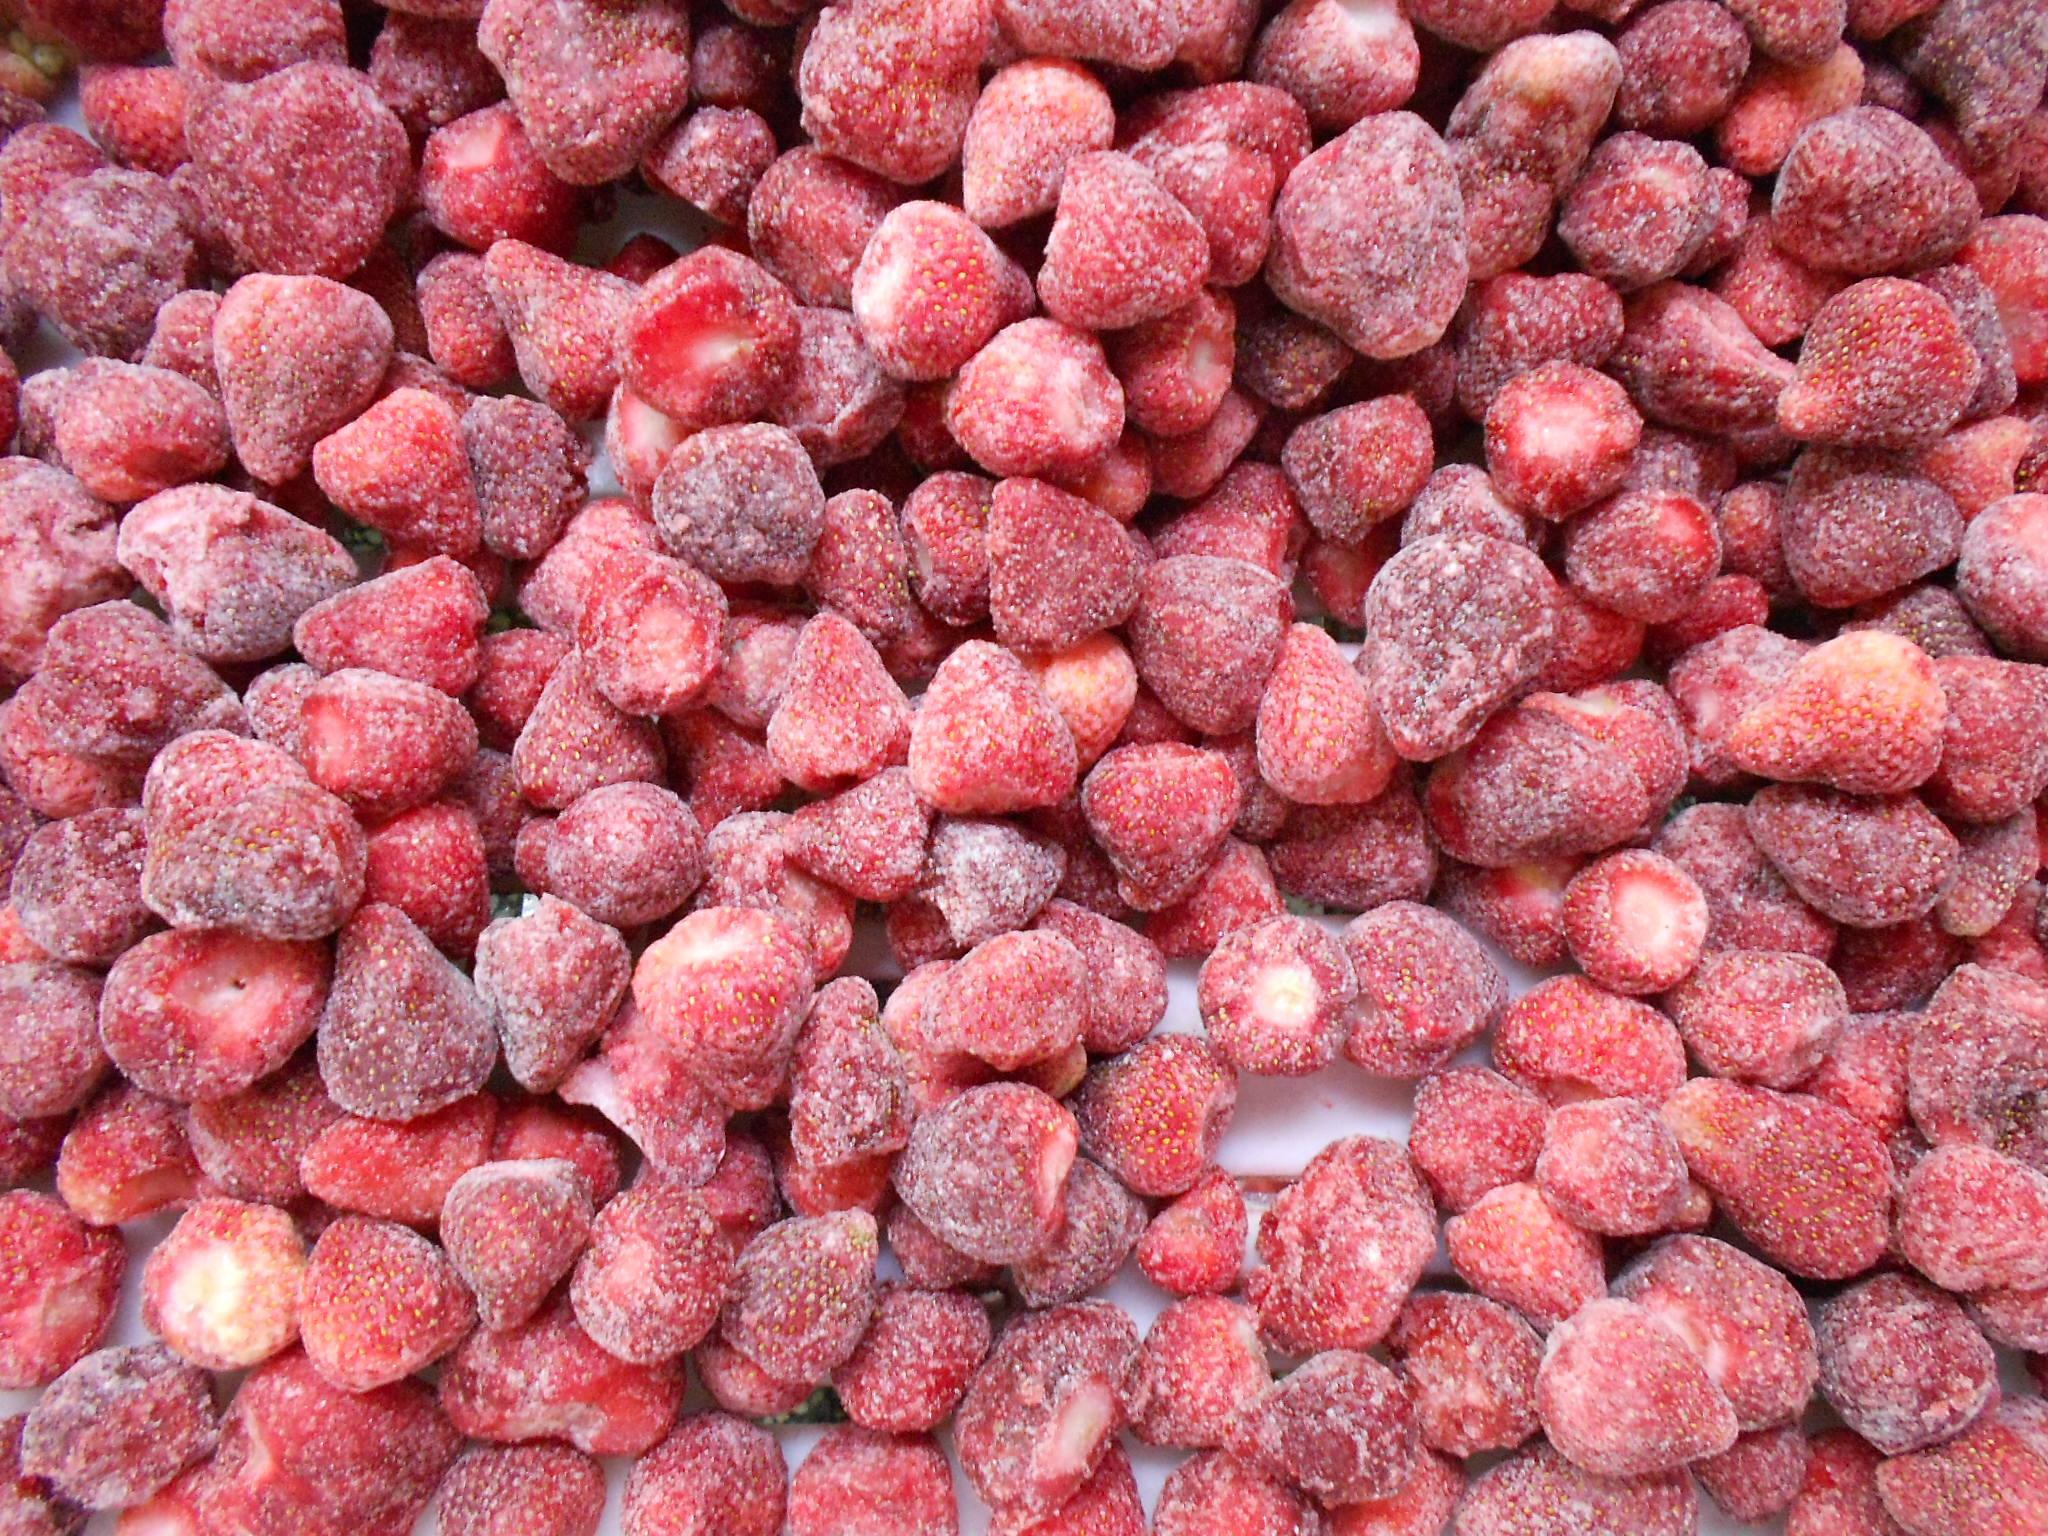 IQF Strawberry,Frozen Strawberry,IQF Strawberries,Frozen Strawberries,Grade A+B